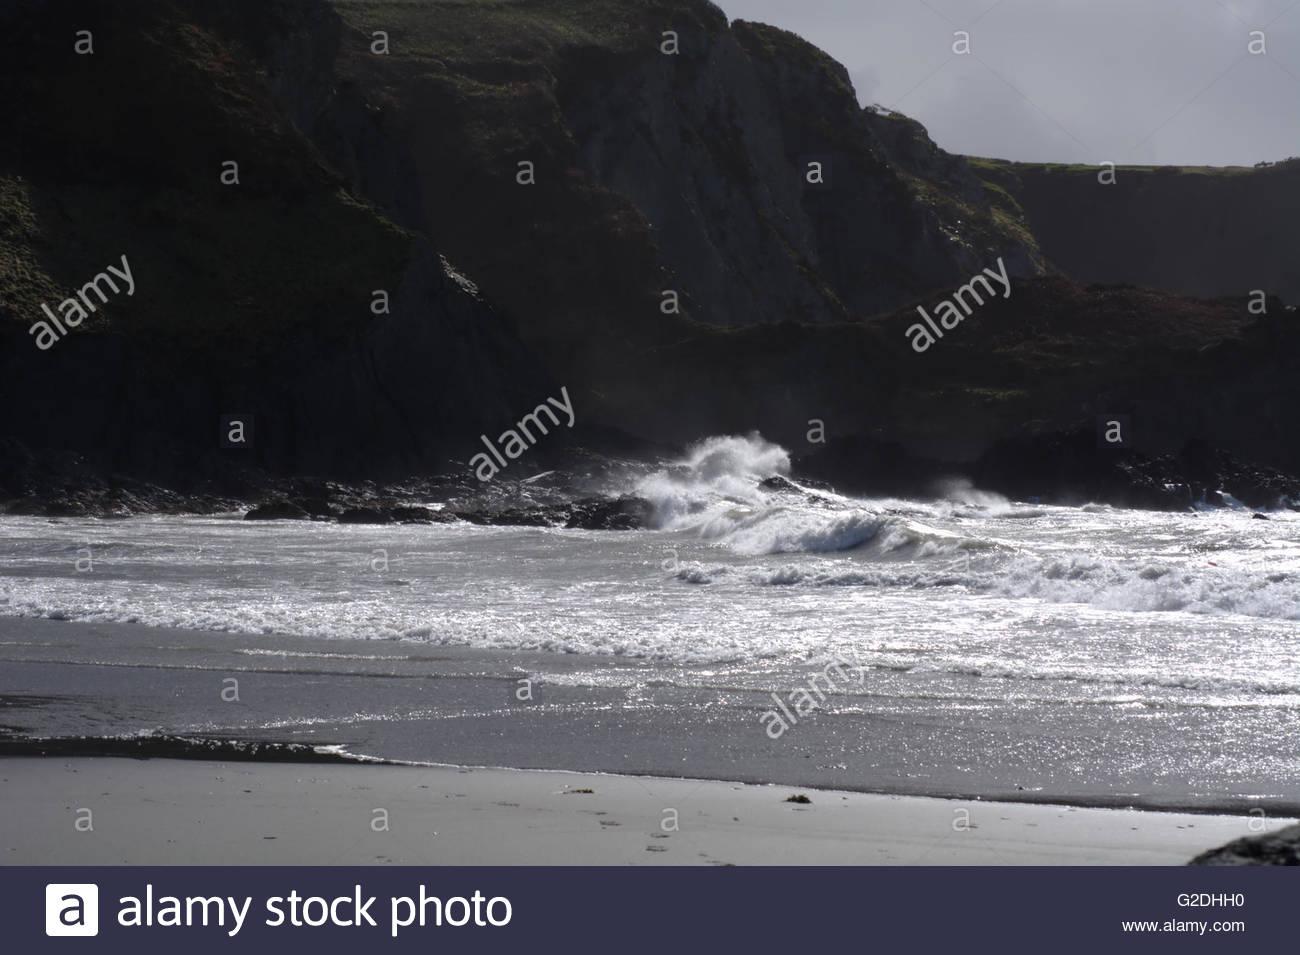 Storm at sea smashing over shore rocks - Stock Image